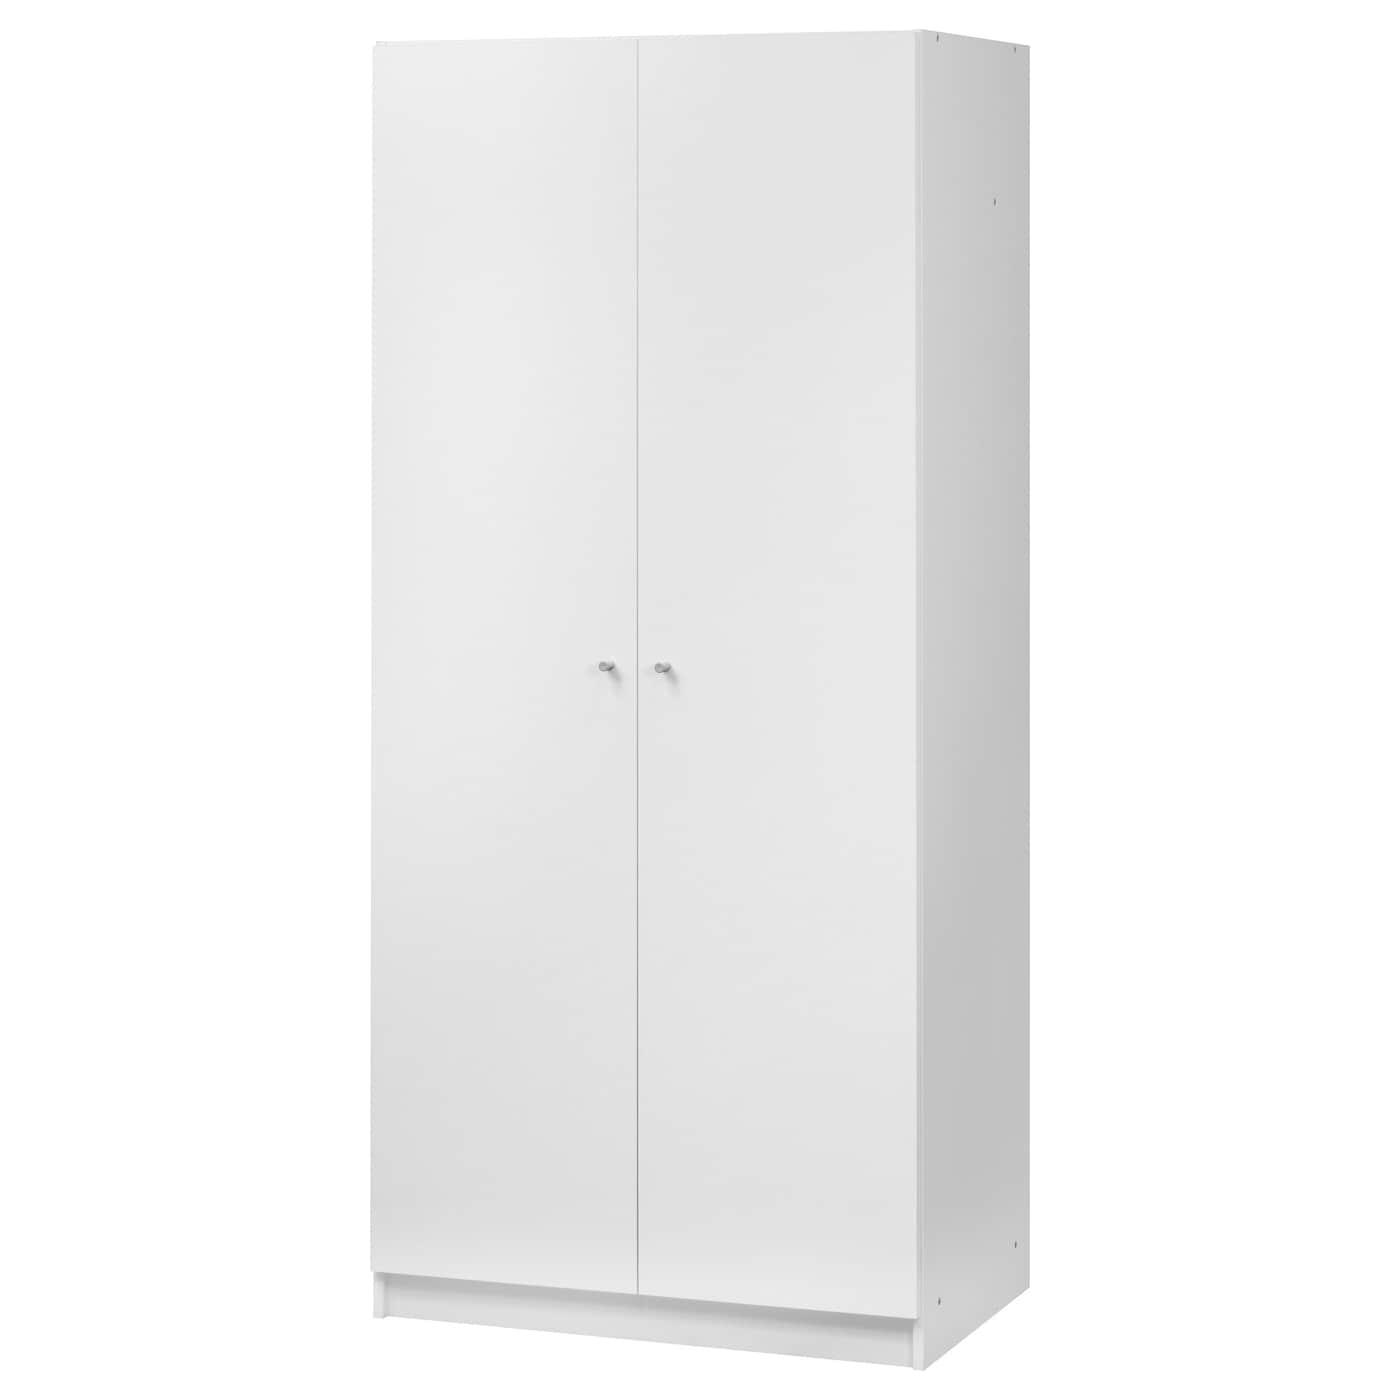 bostrak kledingkast wit 80 x 50 x 180 cm ikea. Black Bedroom Furniture Sets. Home Design Ideas